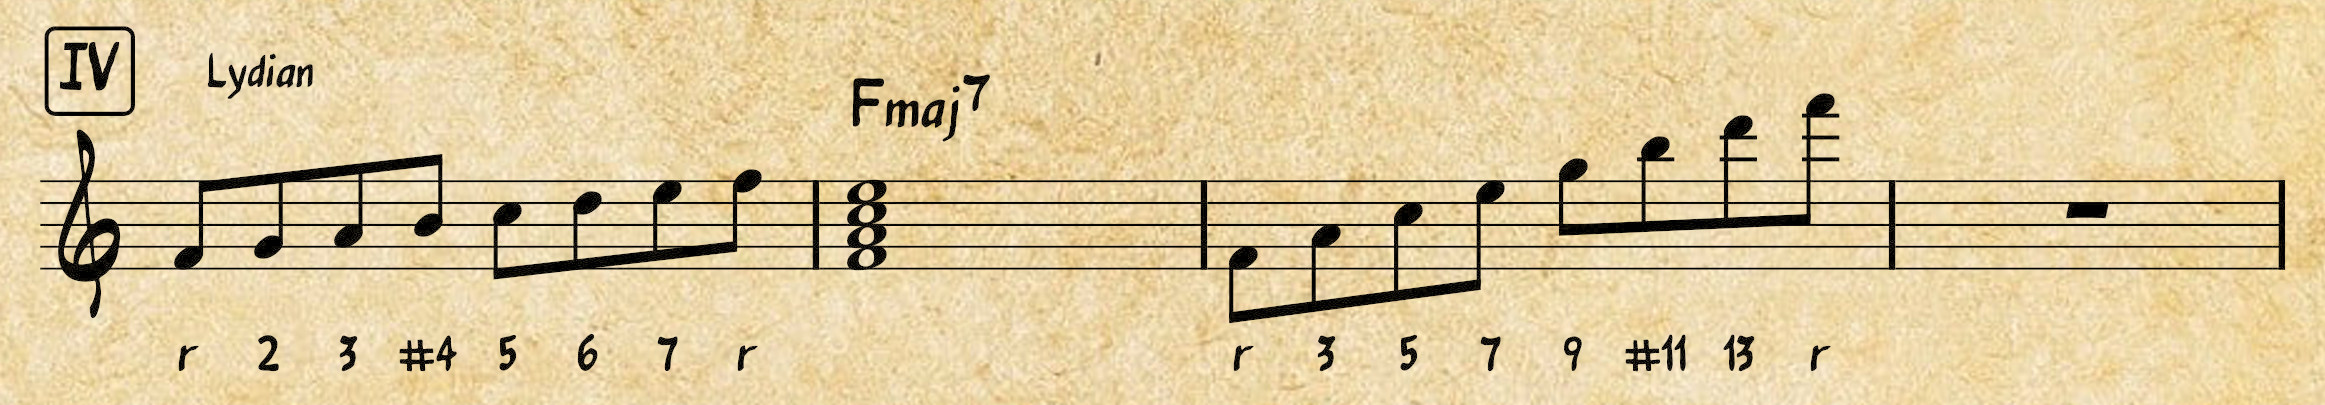 Western Music Theory: Lydian